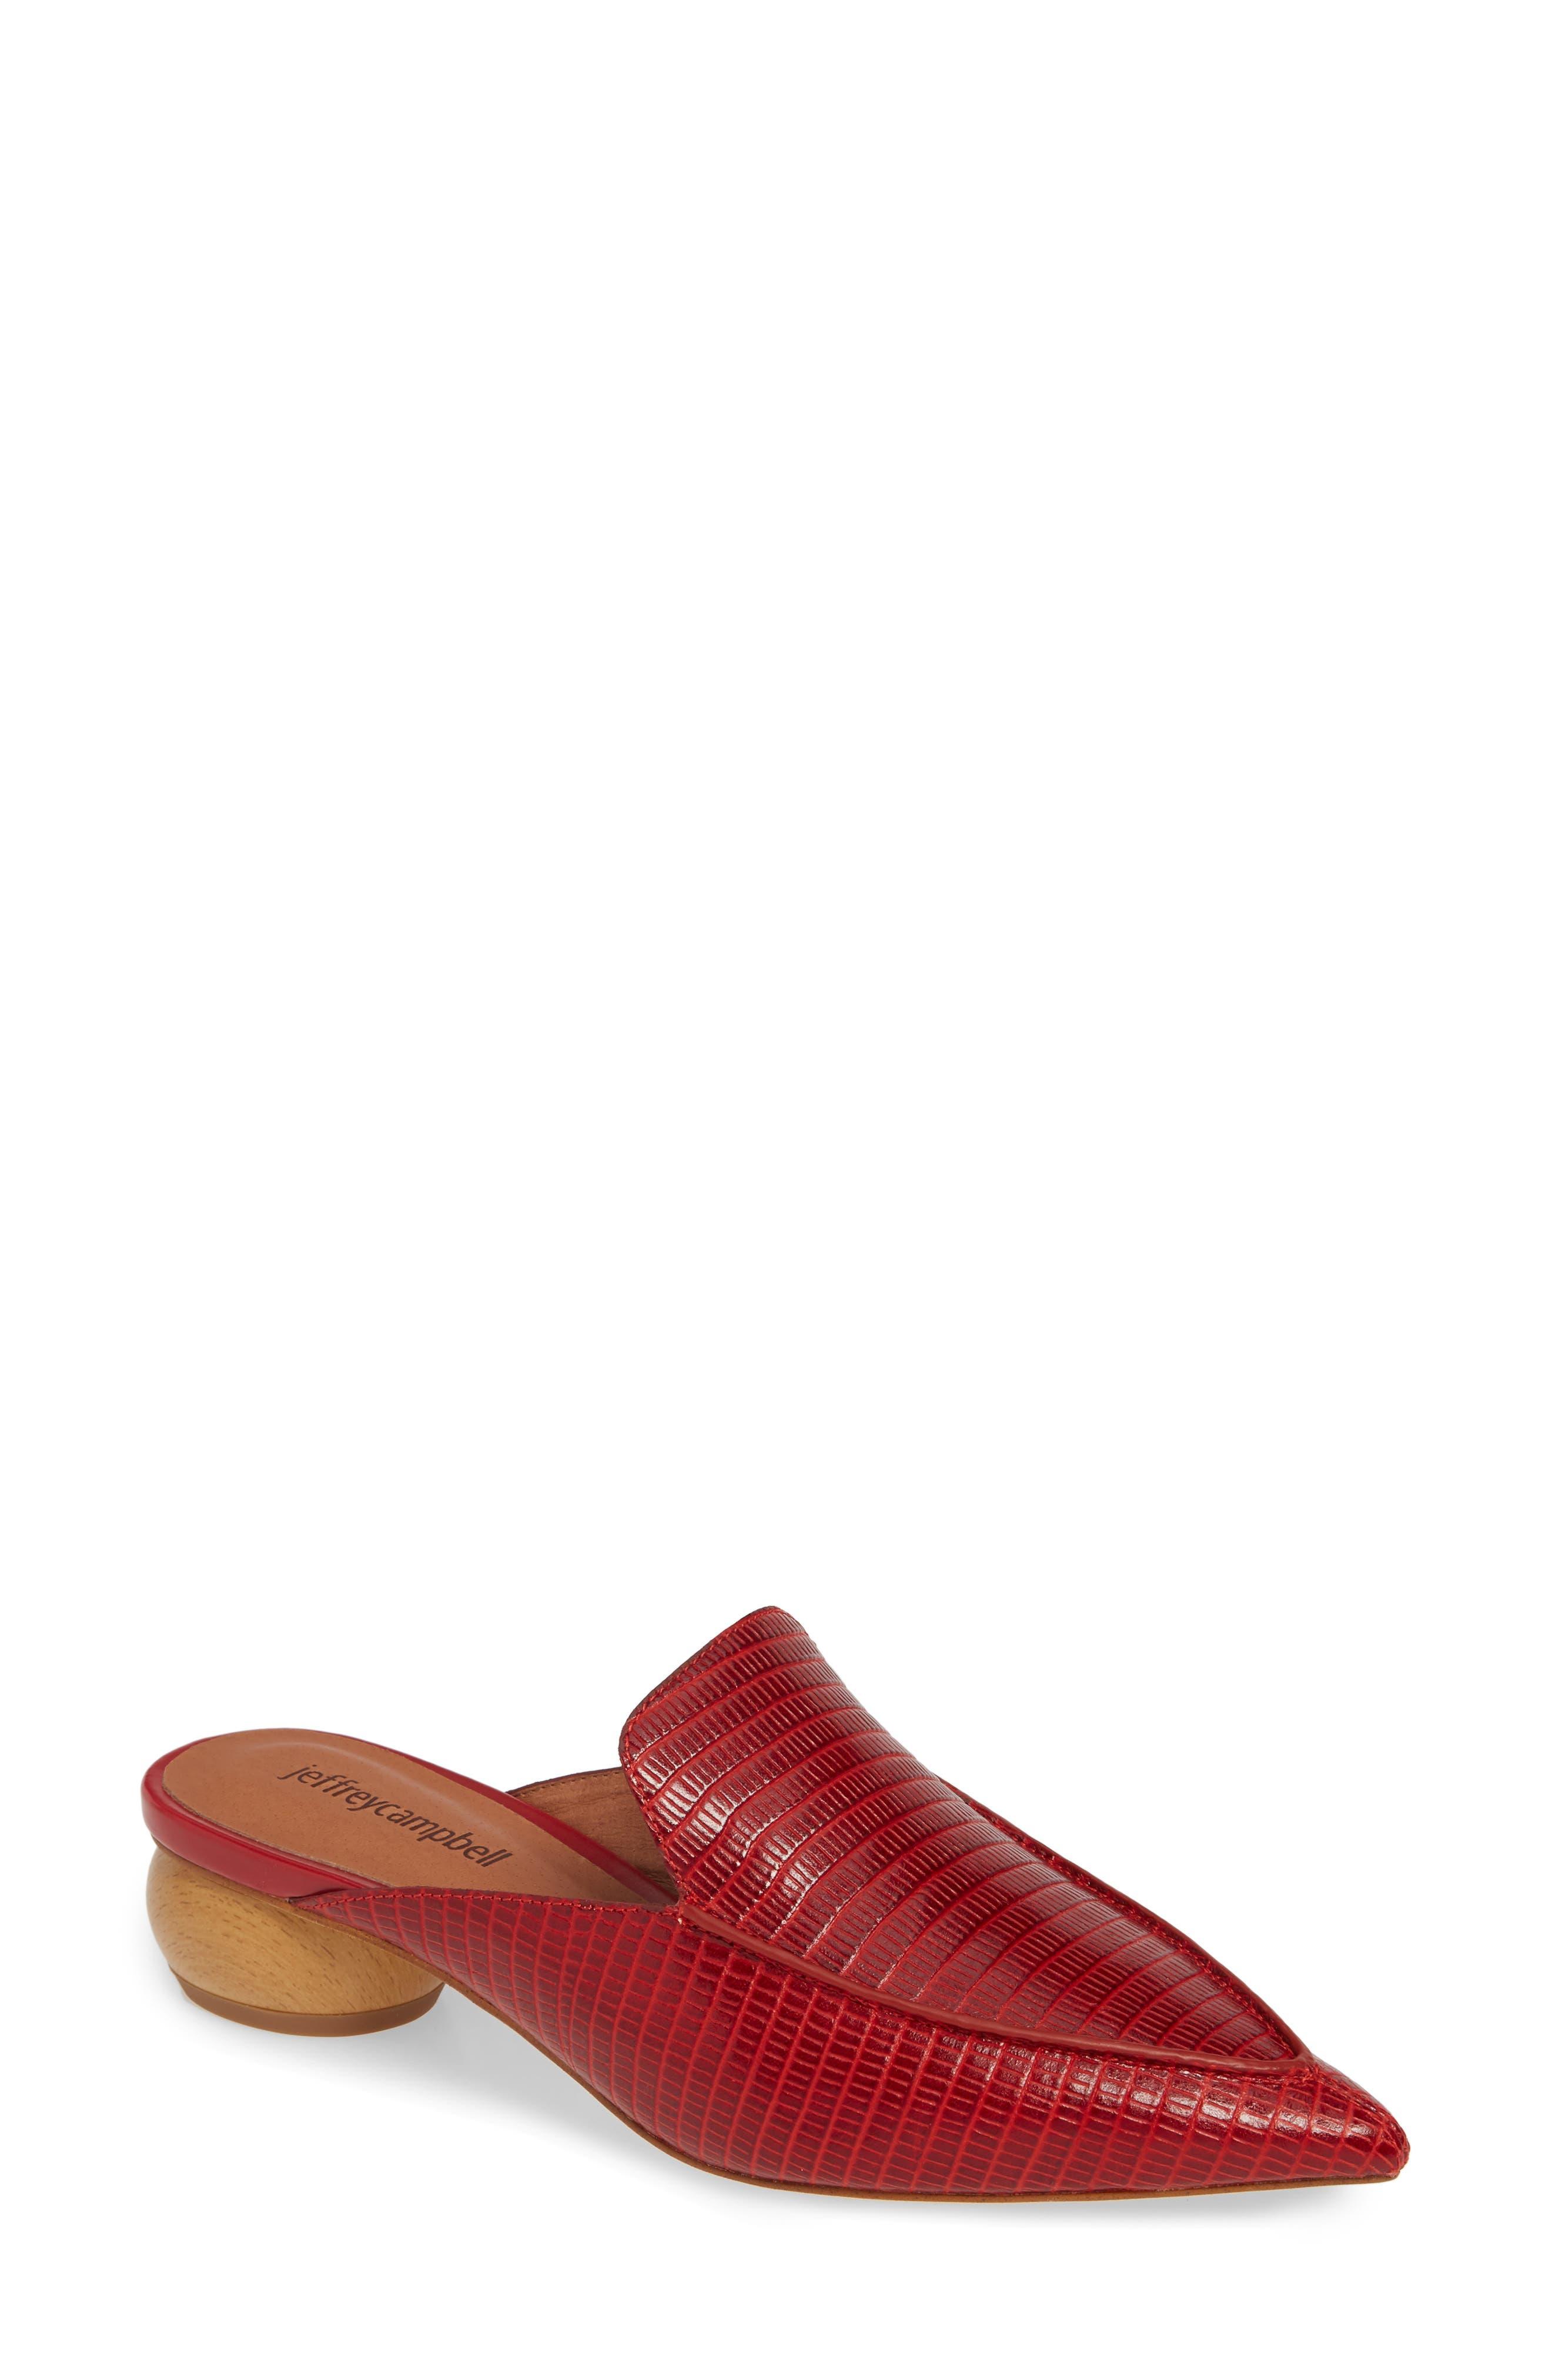 017b15243d1 Jeffrey Campbell Vionit Lizard Embossed Loafer Mule